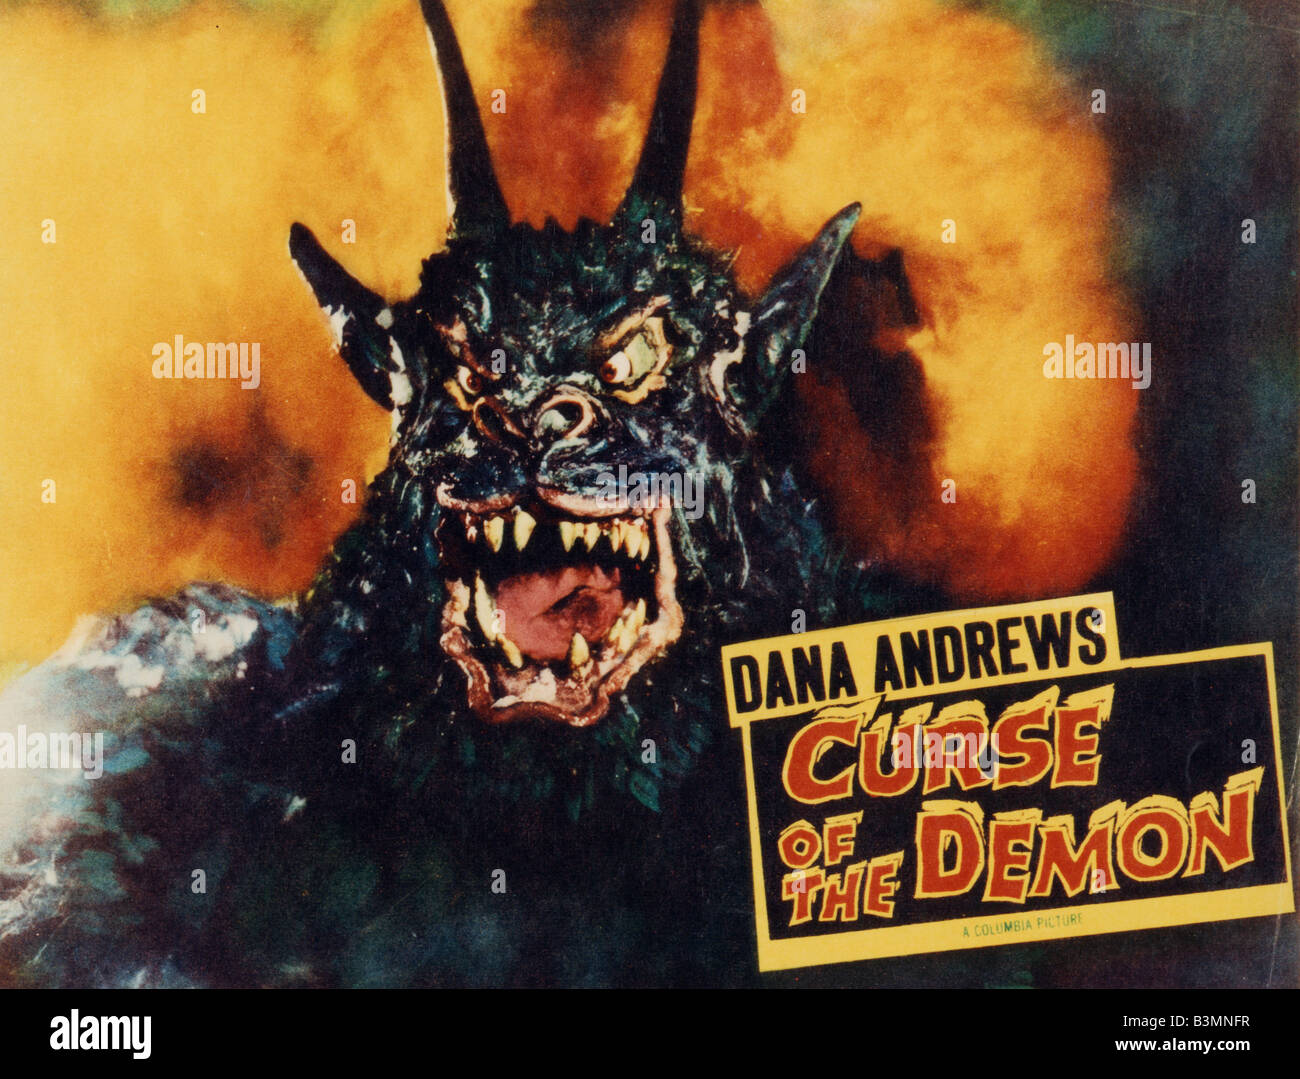 Fluch der Dämon aka Nacht des Dämons - 1957 Columbia film Stockbild